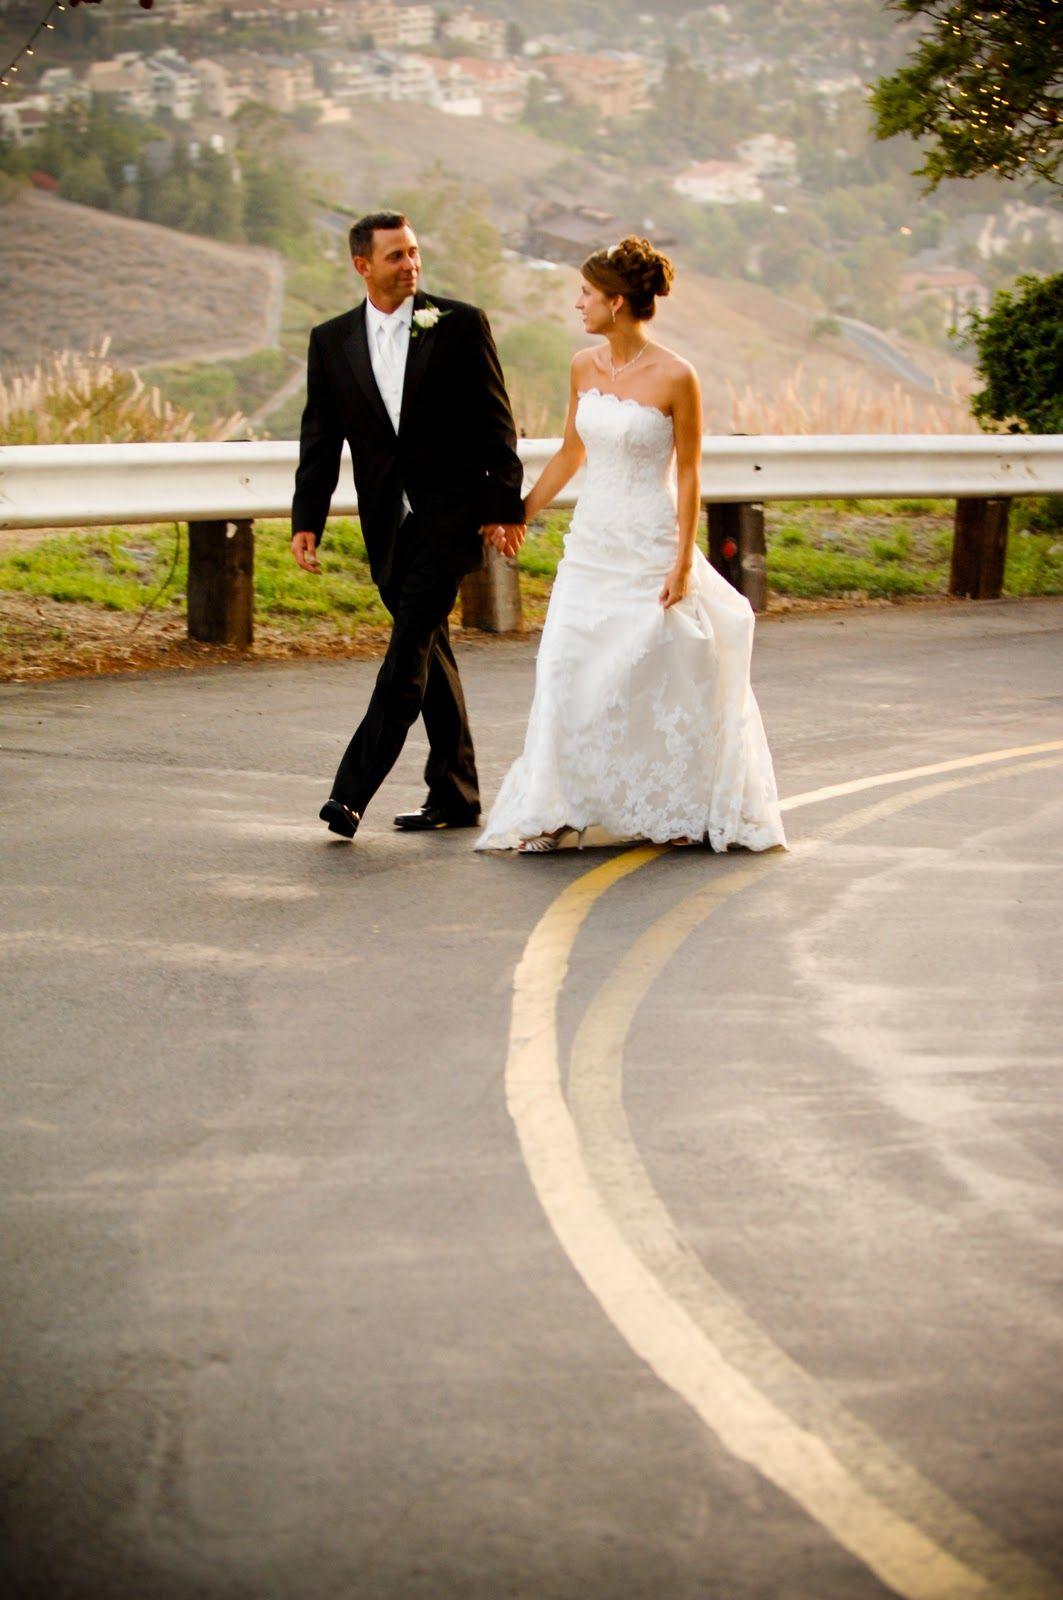 Invite and delight weddingdifferent wedding ideas one day